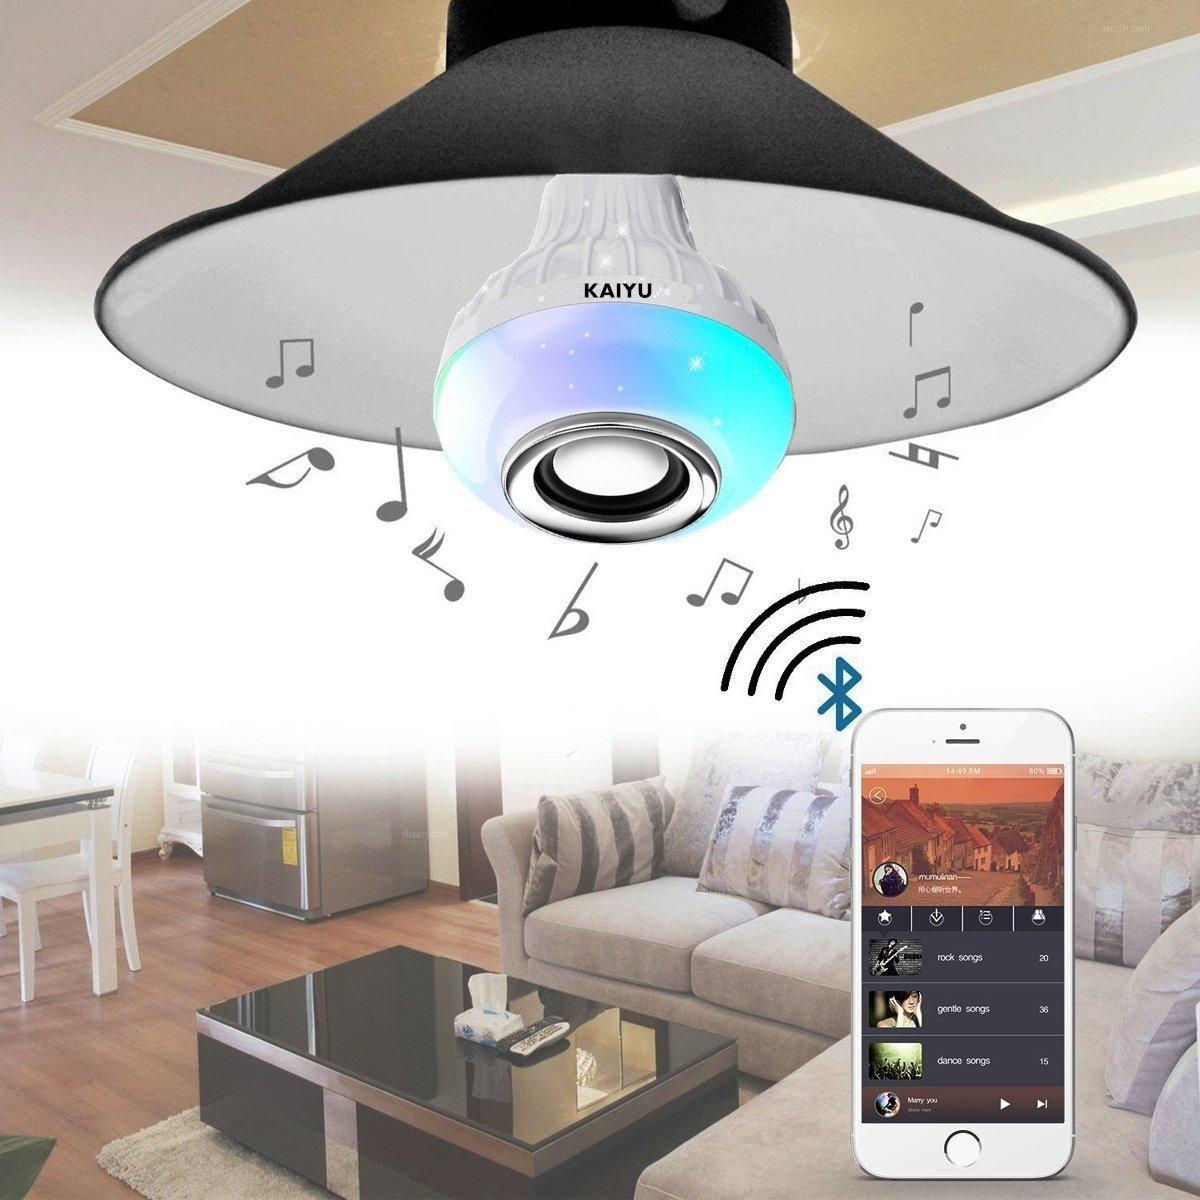 KAIYU LED Bluetooth Light Bulb Speaker - 6W E27 RGB Changing Lamp Wireless Stereo Audio with 24 Keys Remote Control